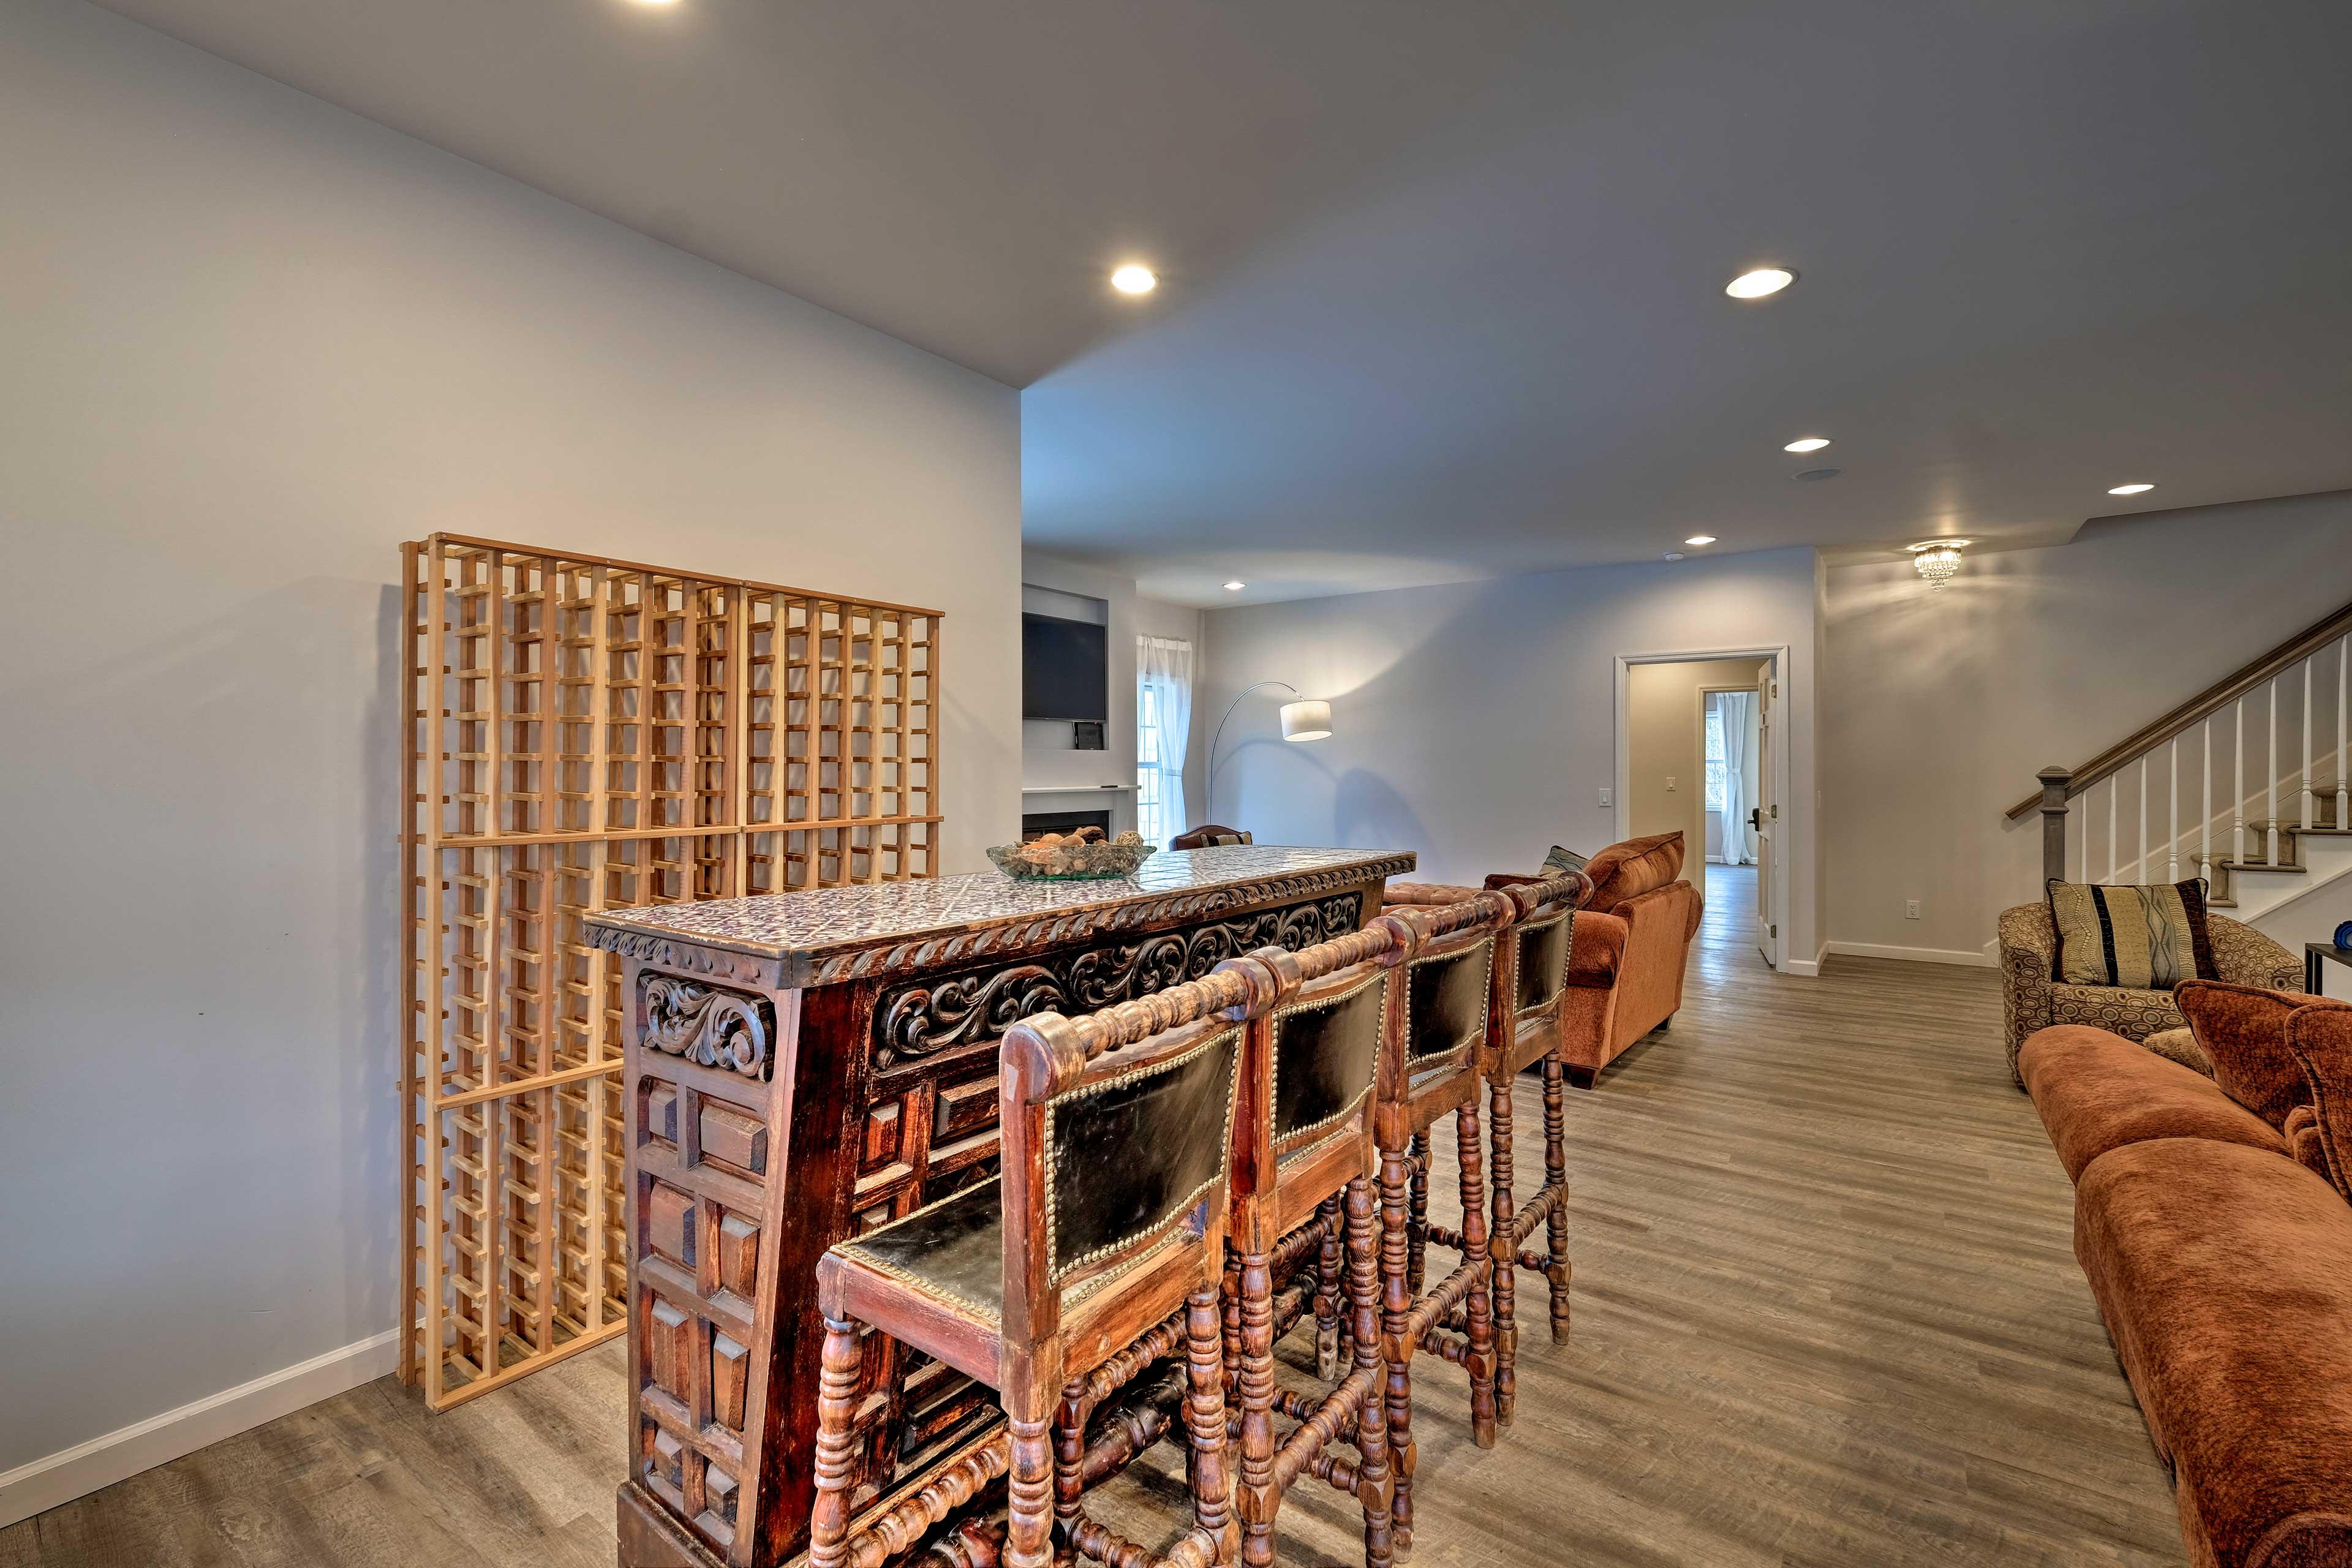 Grab a seat at this incredible, intricate bar.